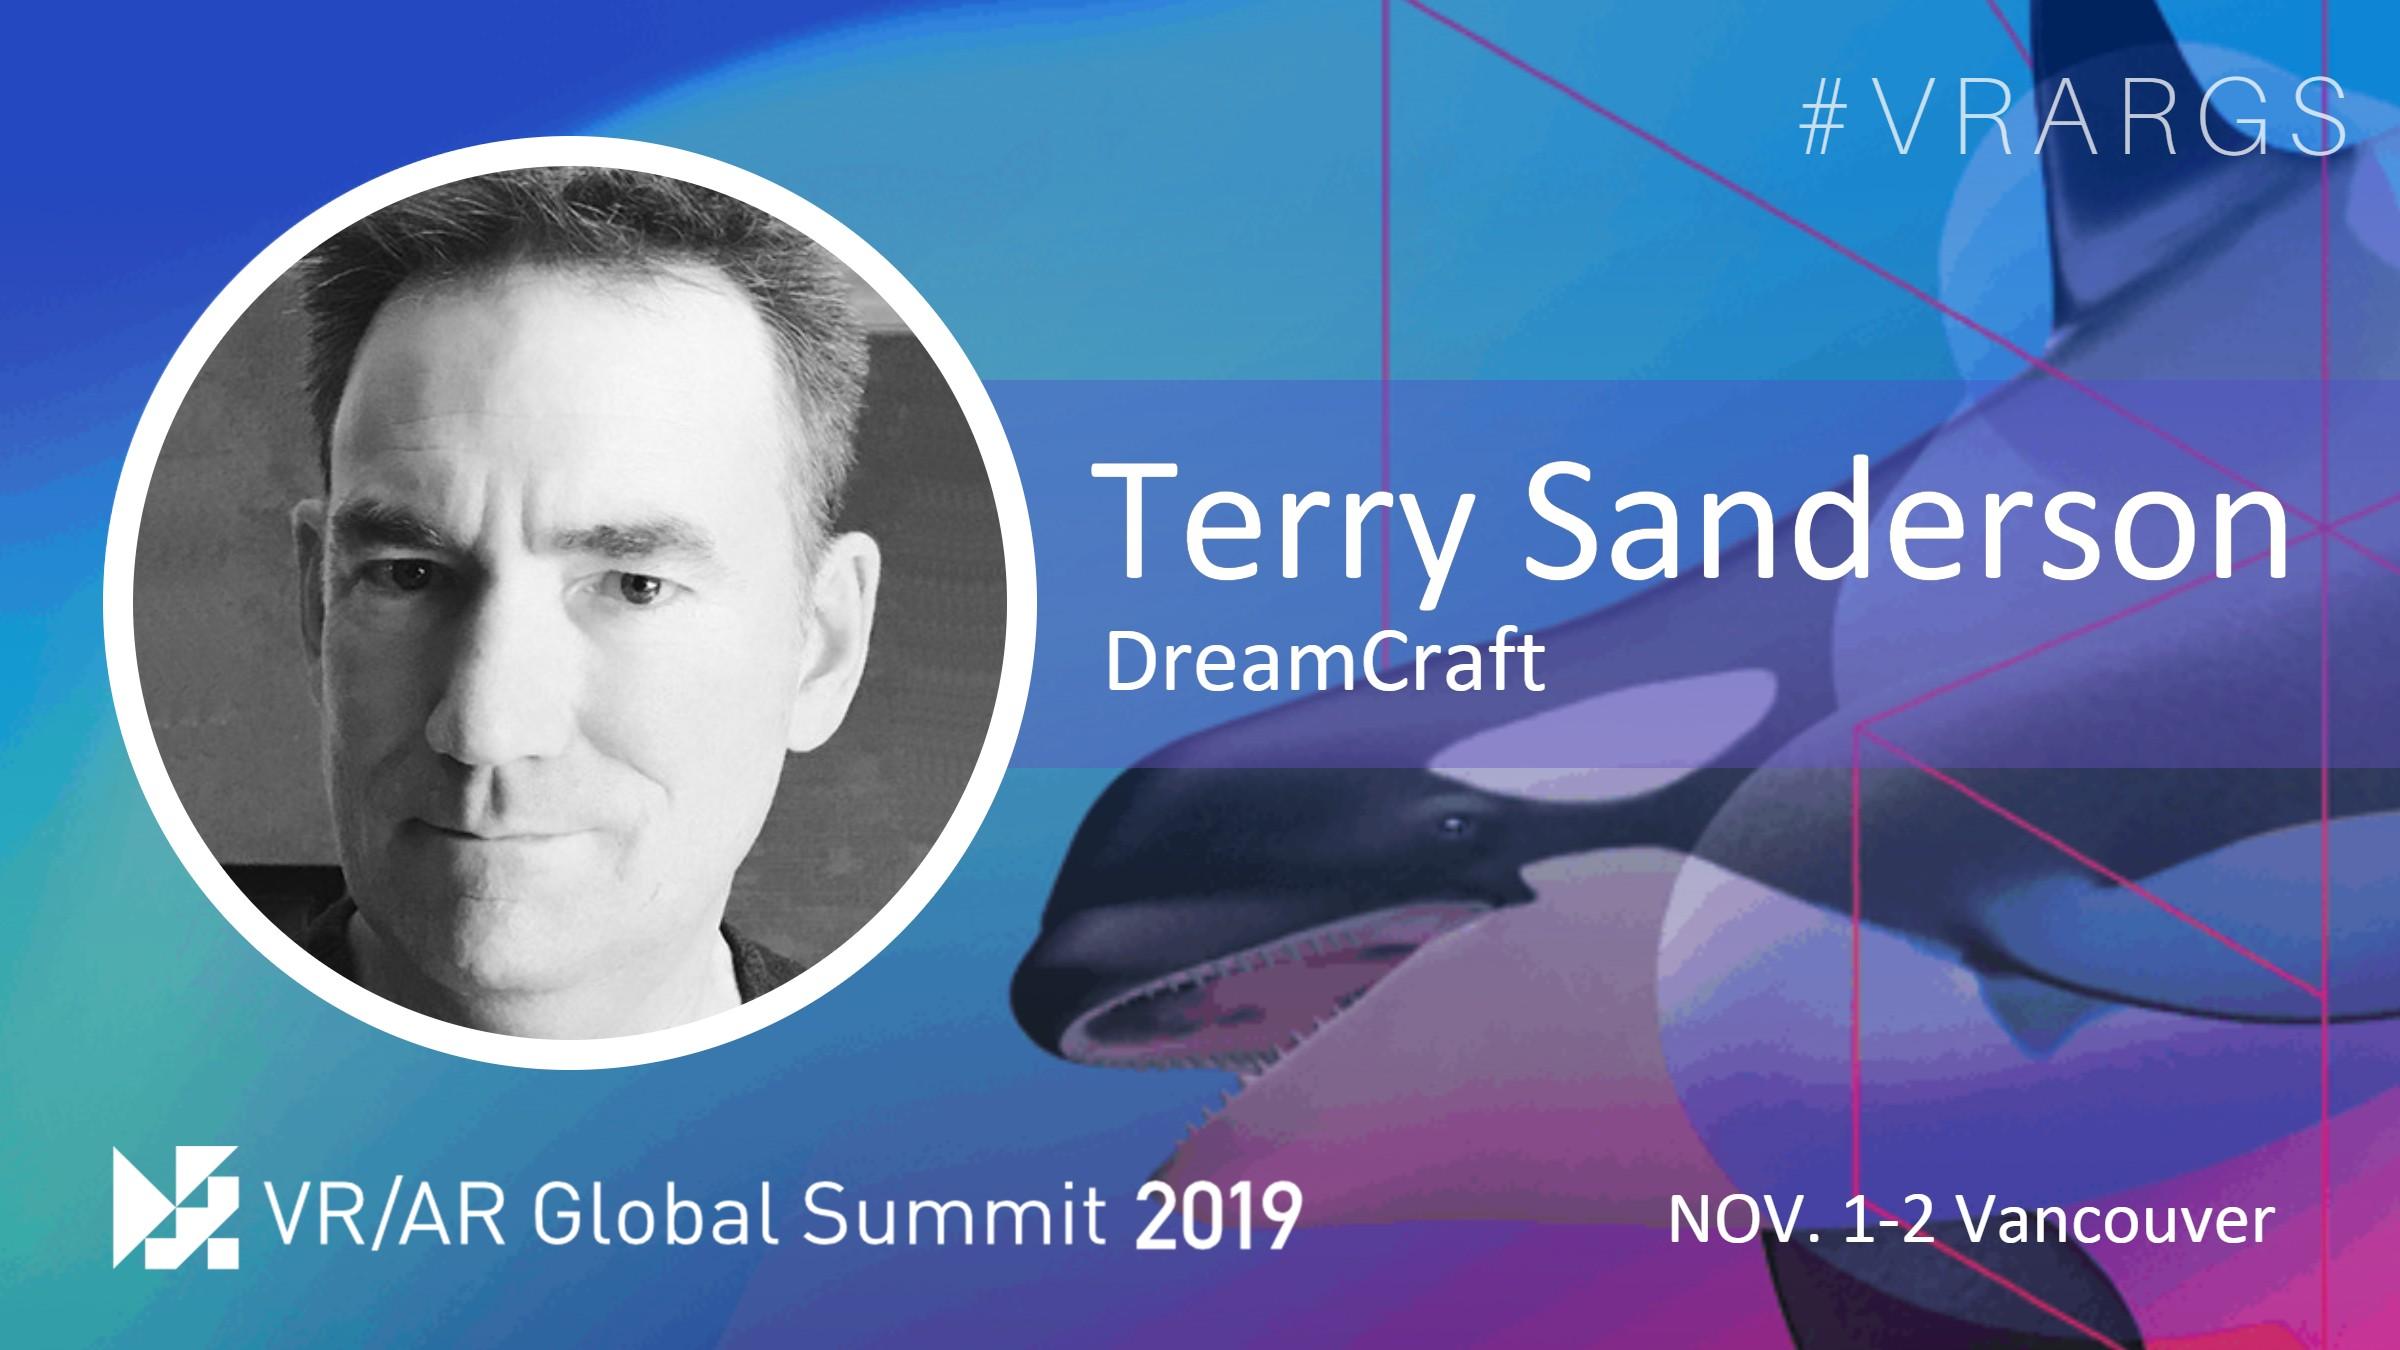 HighRes-Terry-Sanderson-DreamCraft-VRARGS-VRAR-Global-Summit-Spatial-Computing-Vancouver-Women-In-XR.jpg